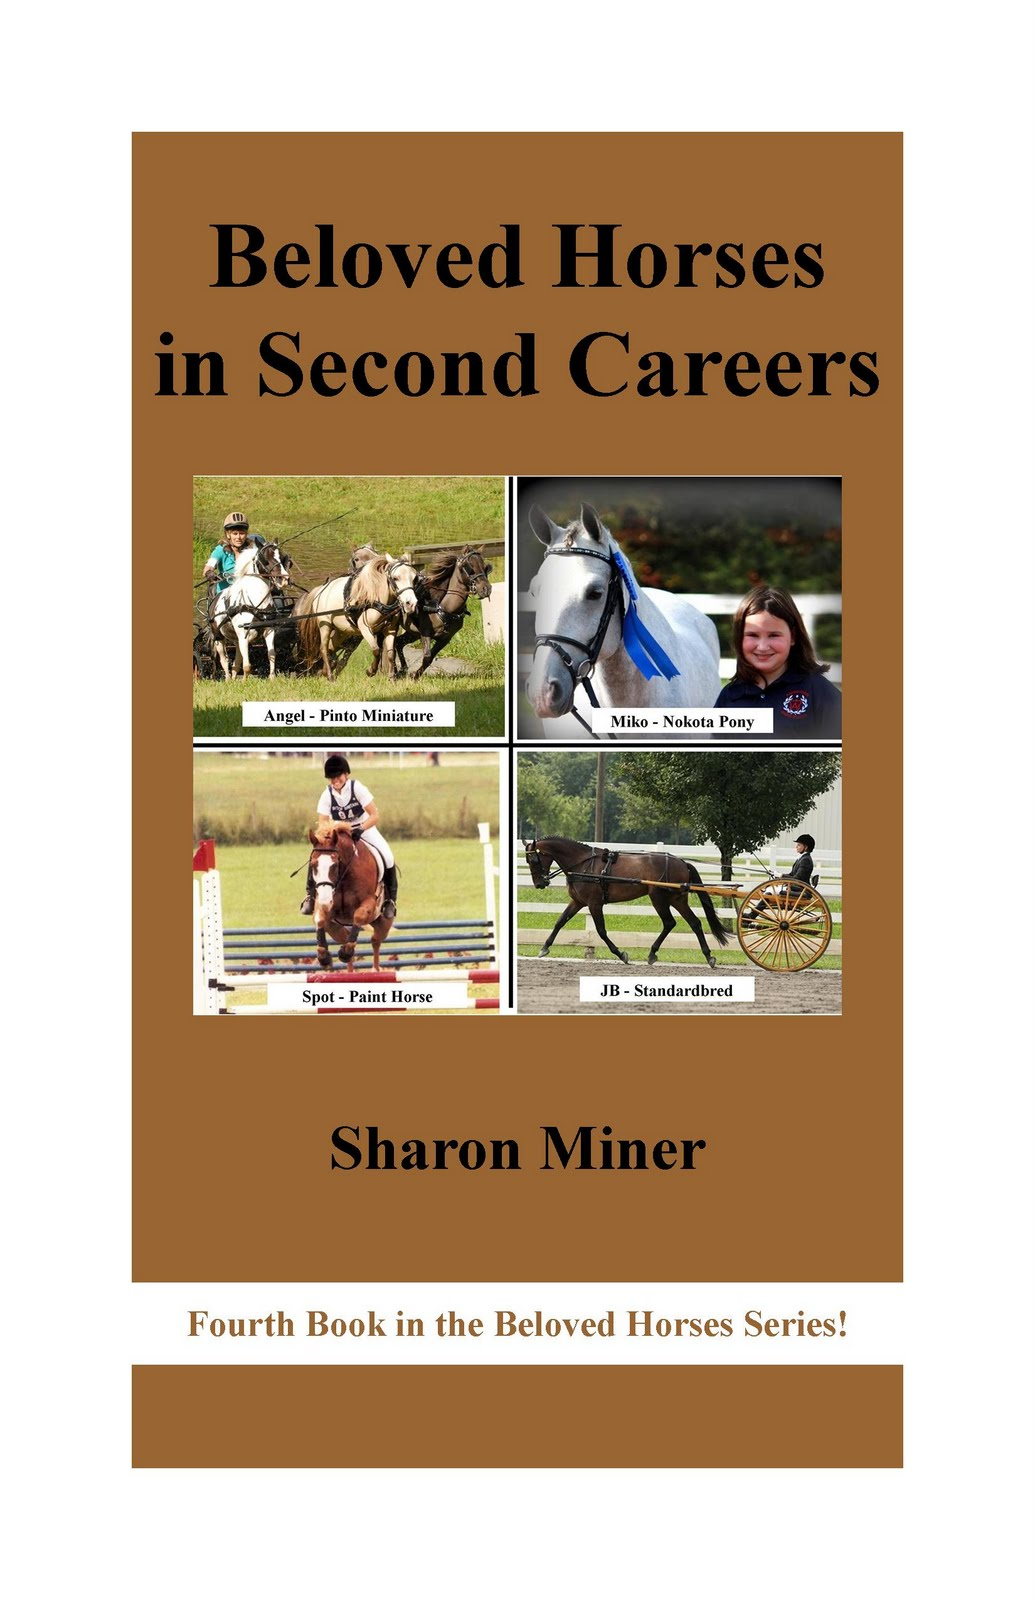 Book Cover Contest : Horse book reviews cover contest result